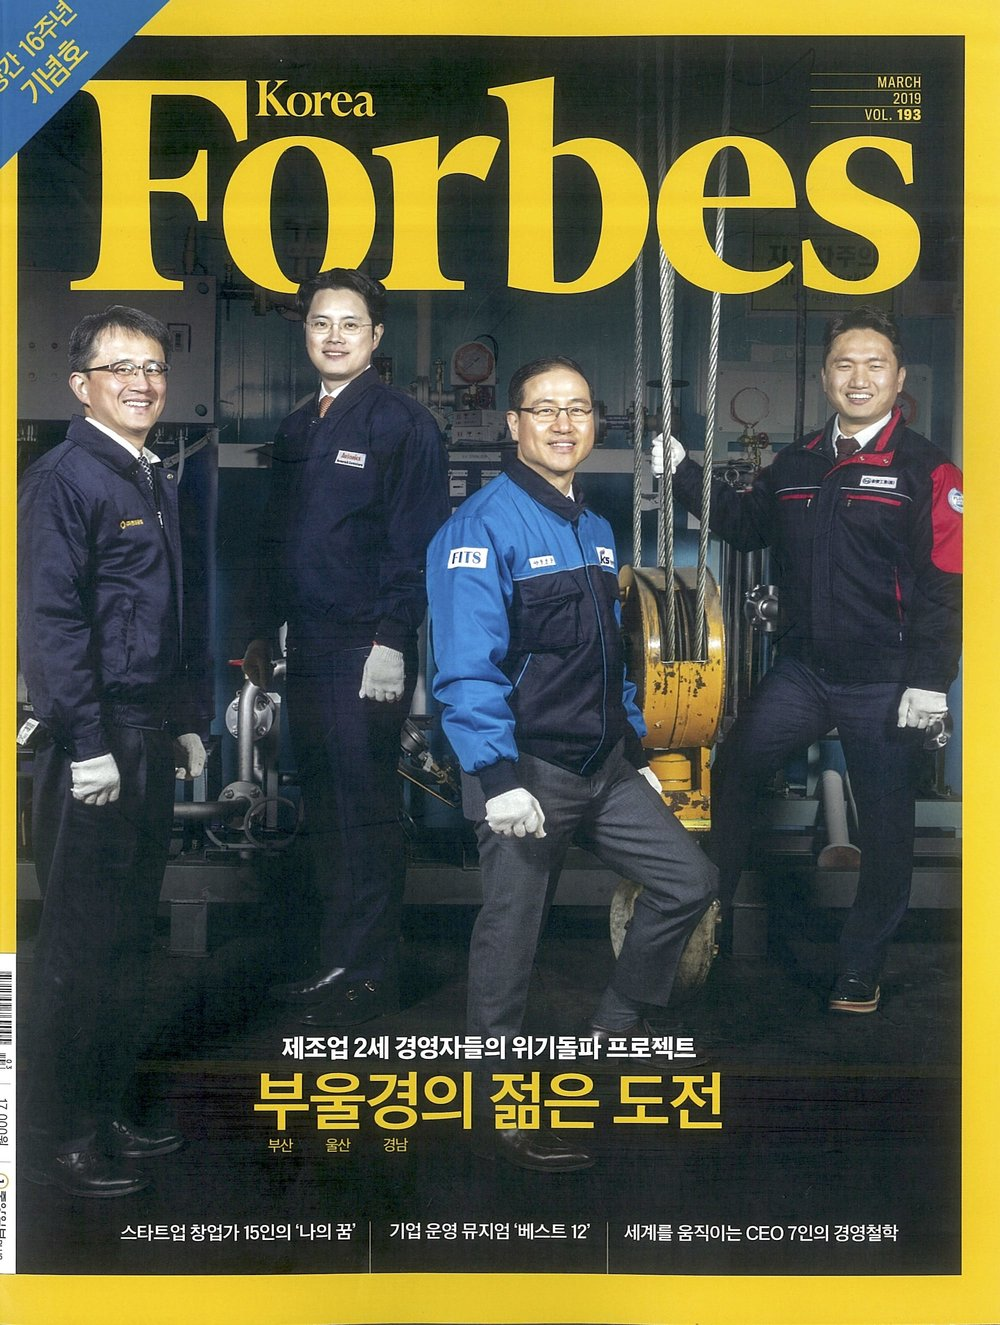 Forbes_Vol 193 MAR 2019_P290-29611.jpg